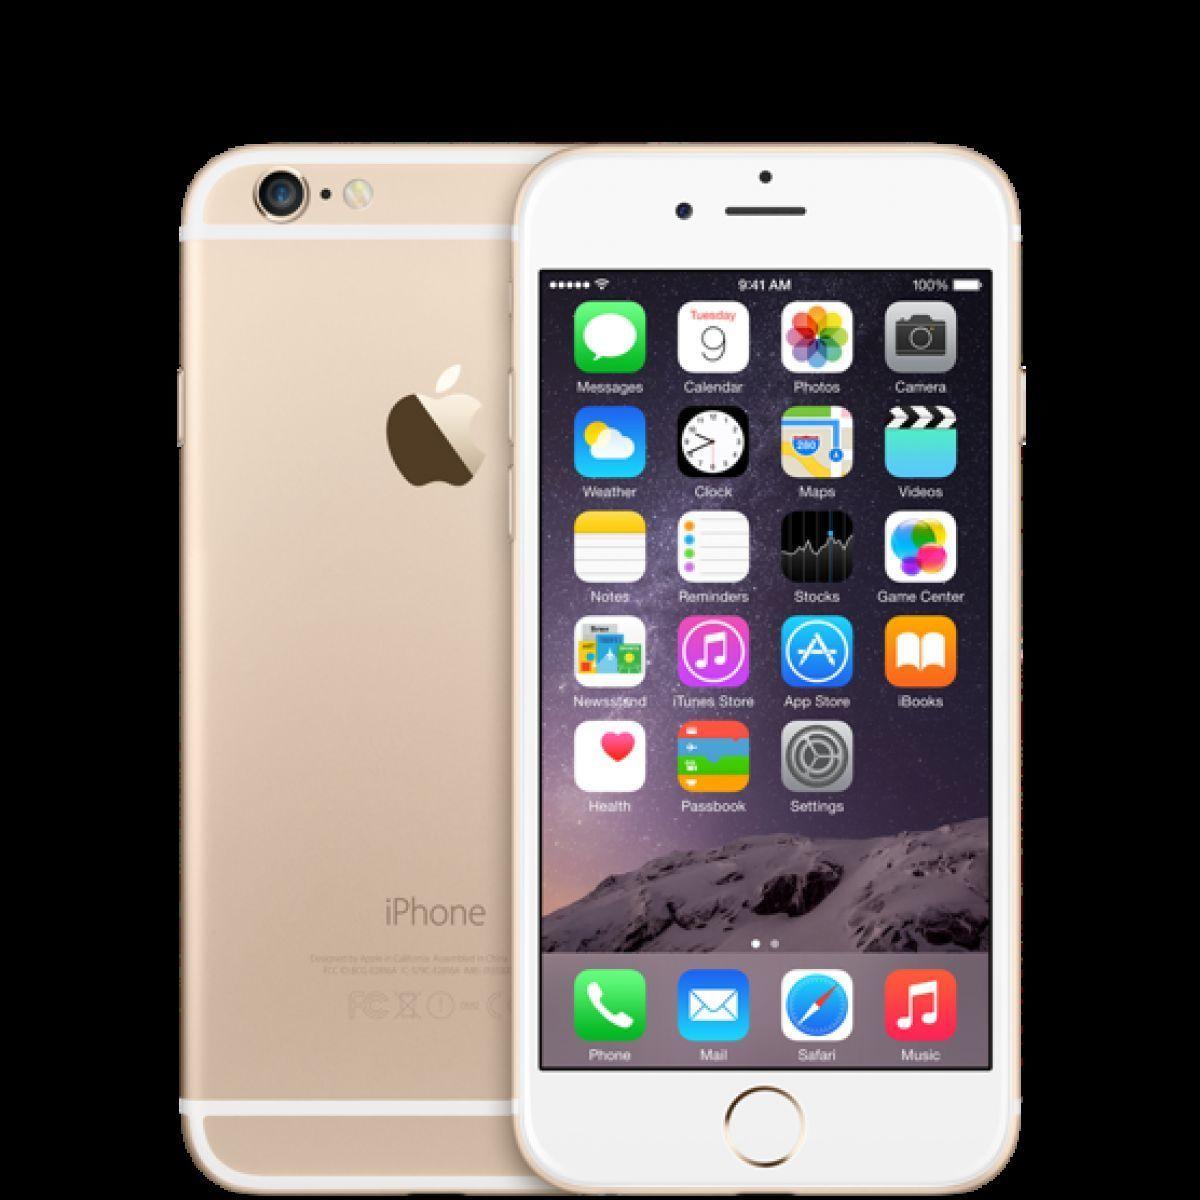 apple iphone 6 latest model 16gb gold boost mobile. Black Bedroom Furniture Sets. Home Design Ideas